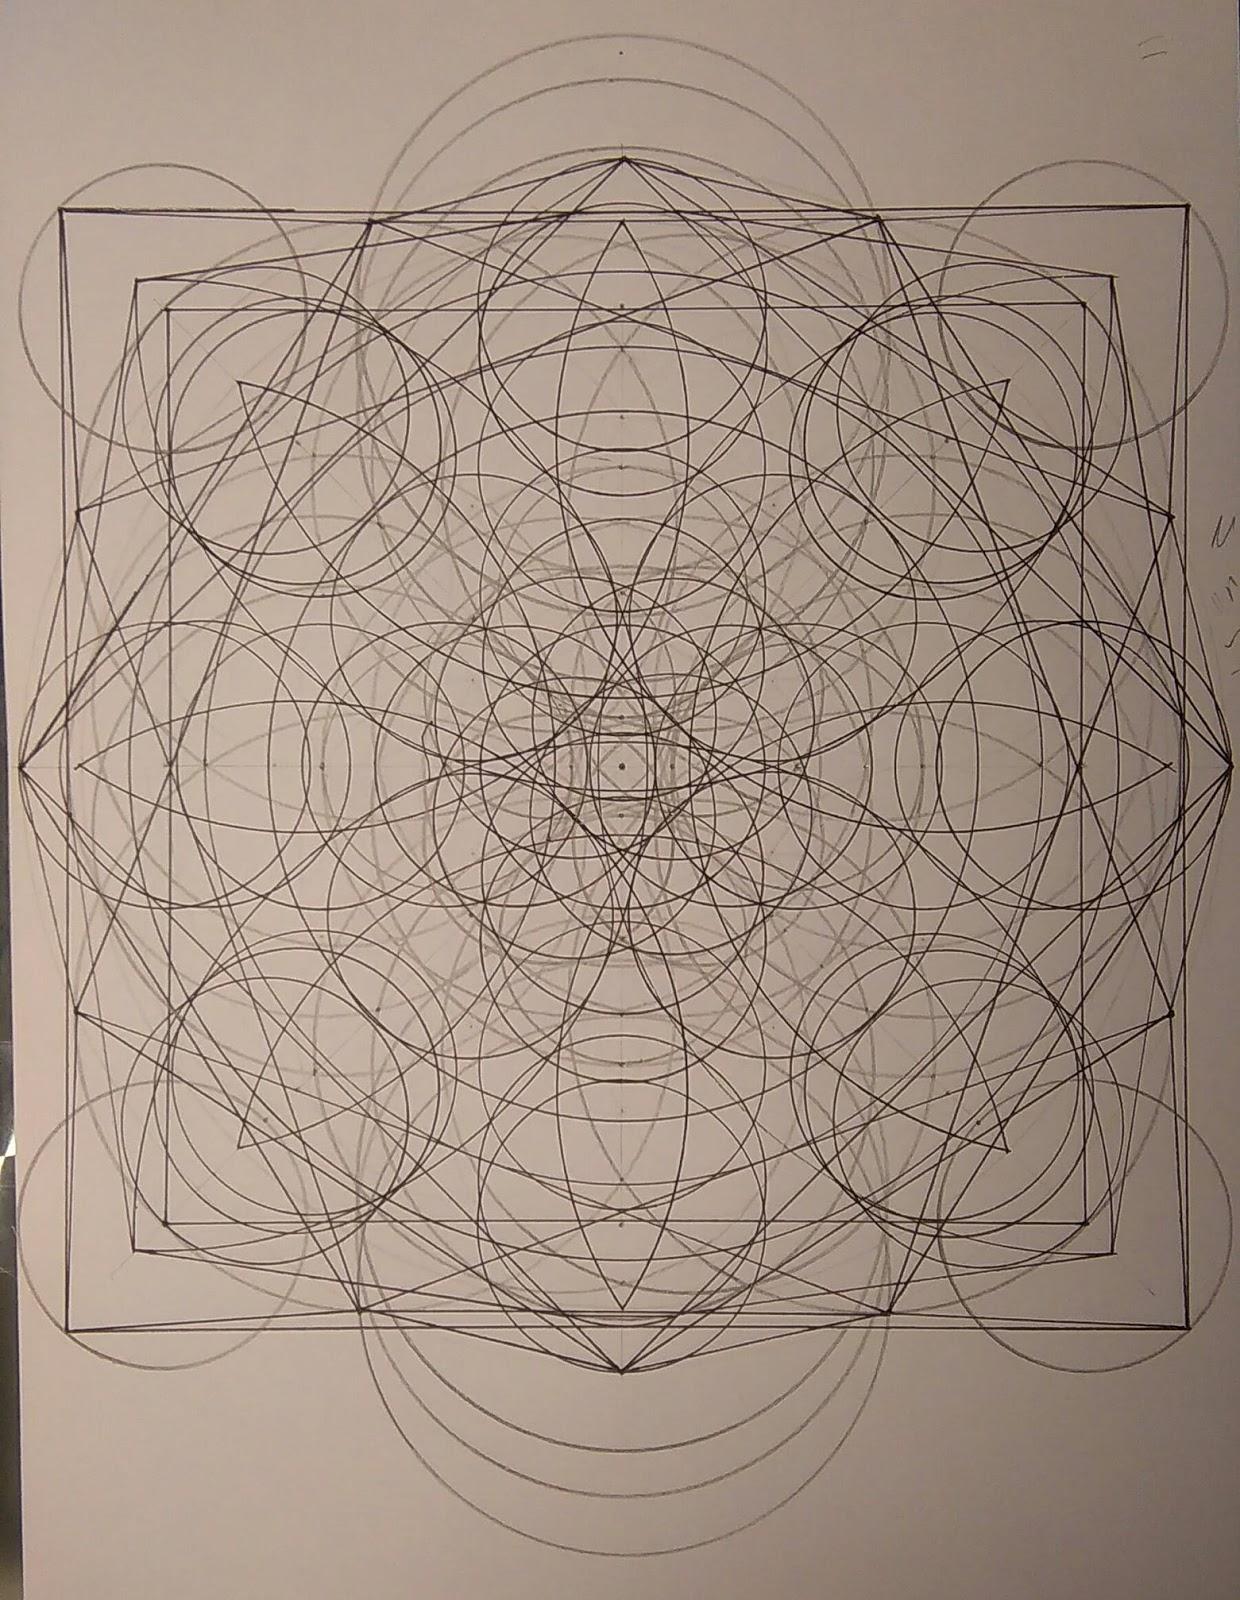 [SPOLYK] - Geometries & sketches - Page 6 47494249_1099648766888473_7484654354994036736_o